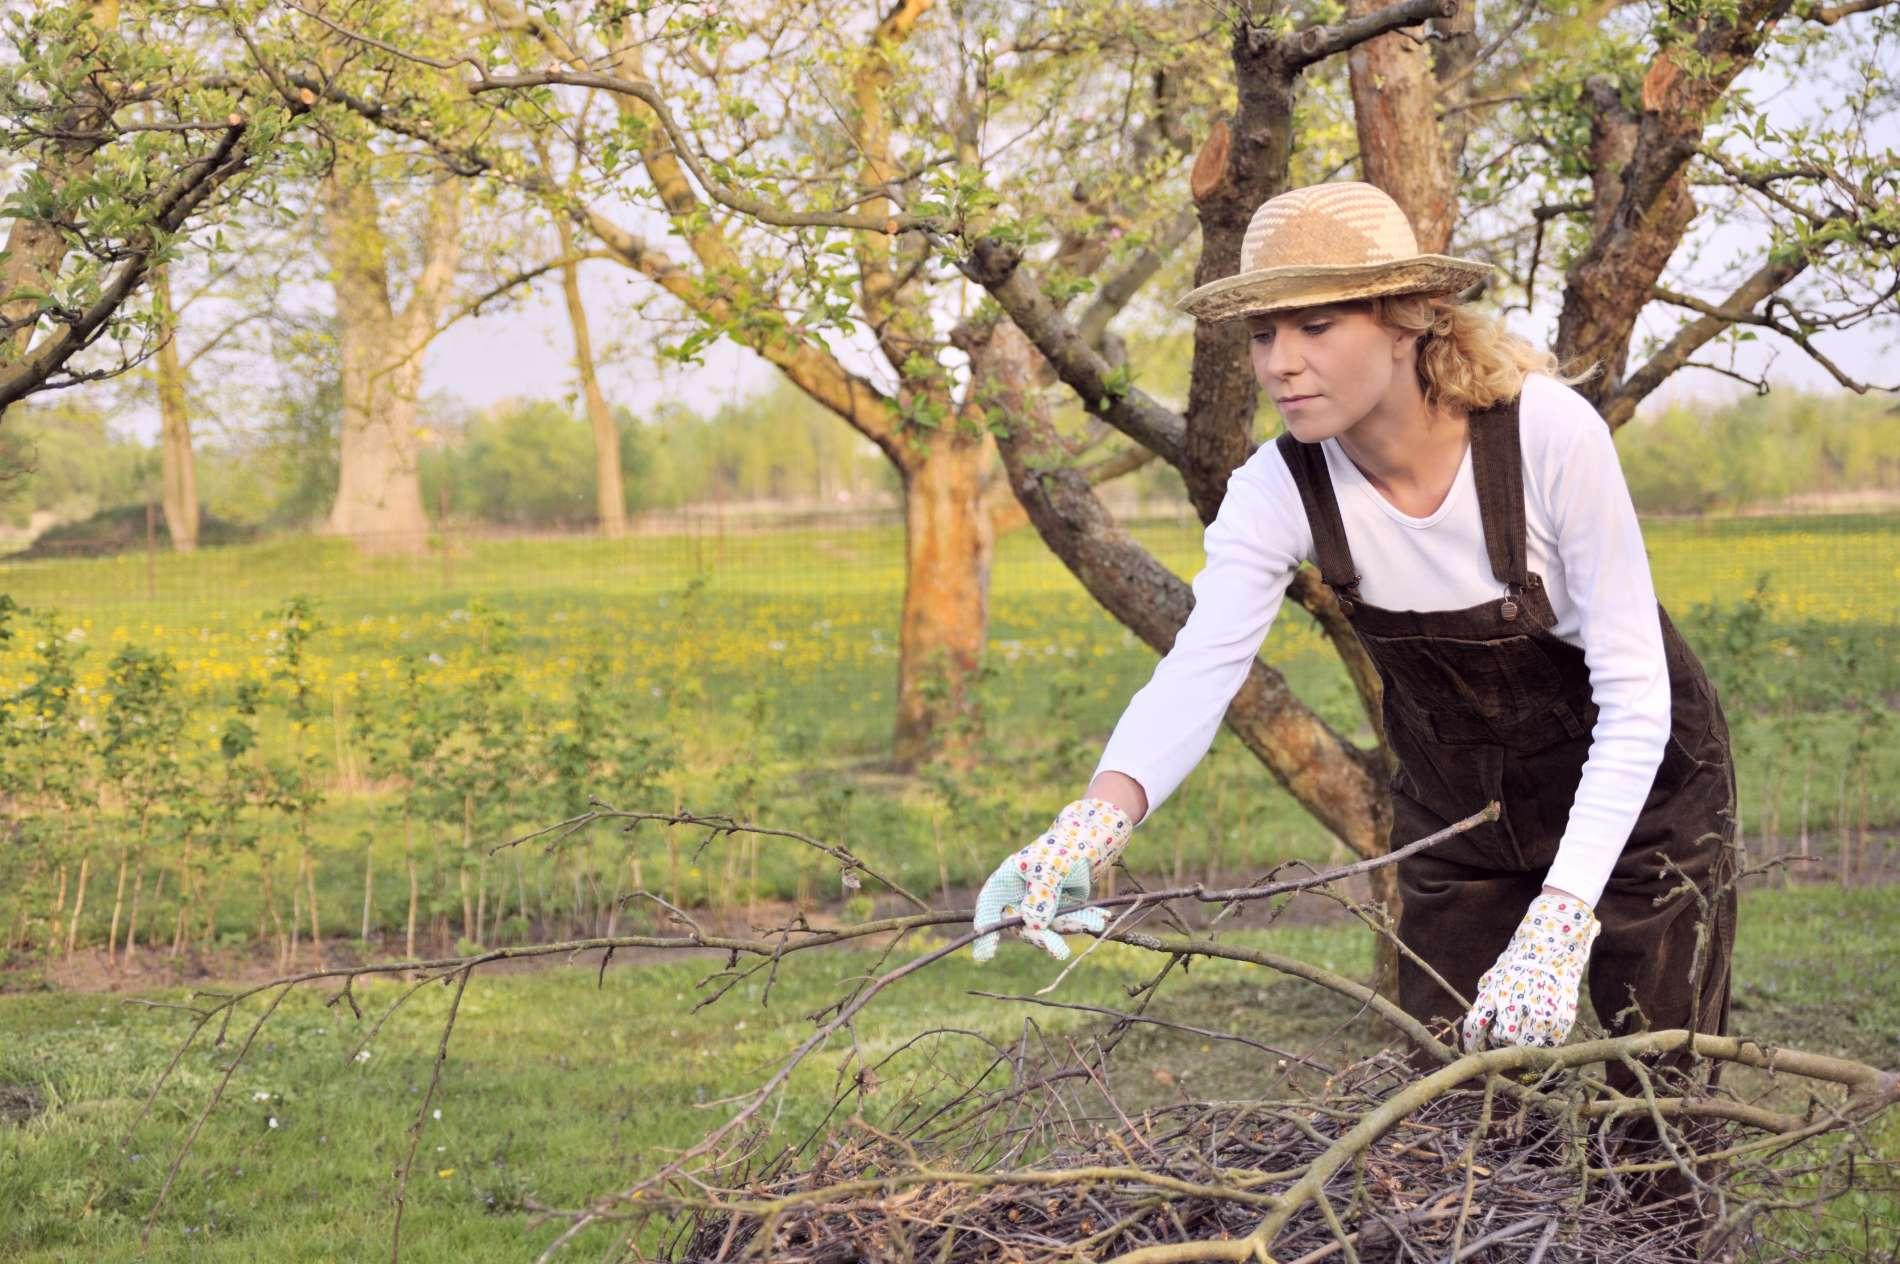 Teks pasiraitoti rankoves: kokius darbus sode reikia nuveikti pirmiausia?